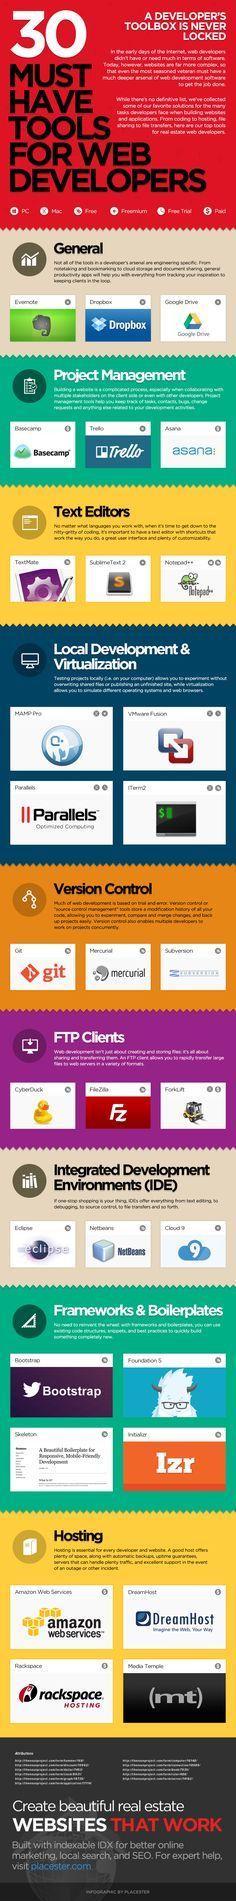 30 Must Have Tools for Web Developers Latest News & Trends on #webdesign and #webdevelopment | http://webworksagency.com